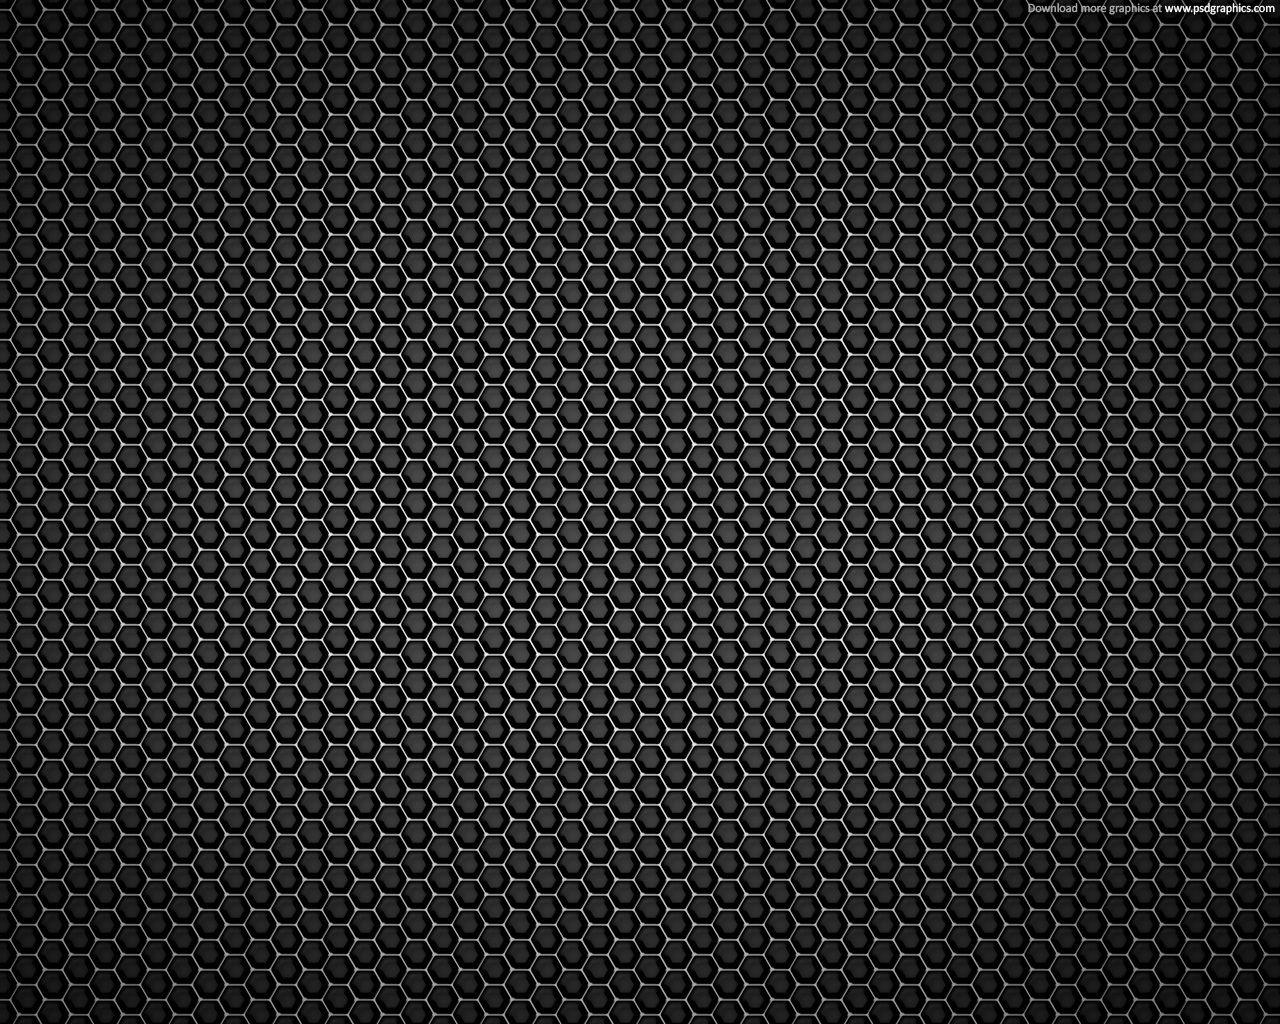 Honeycomb Metal Background Metal Texture Metal Background Textured Background